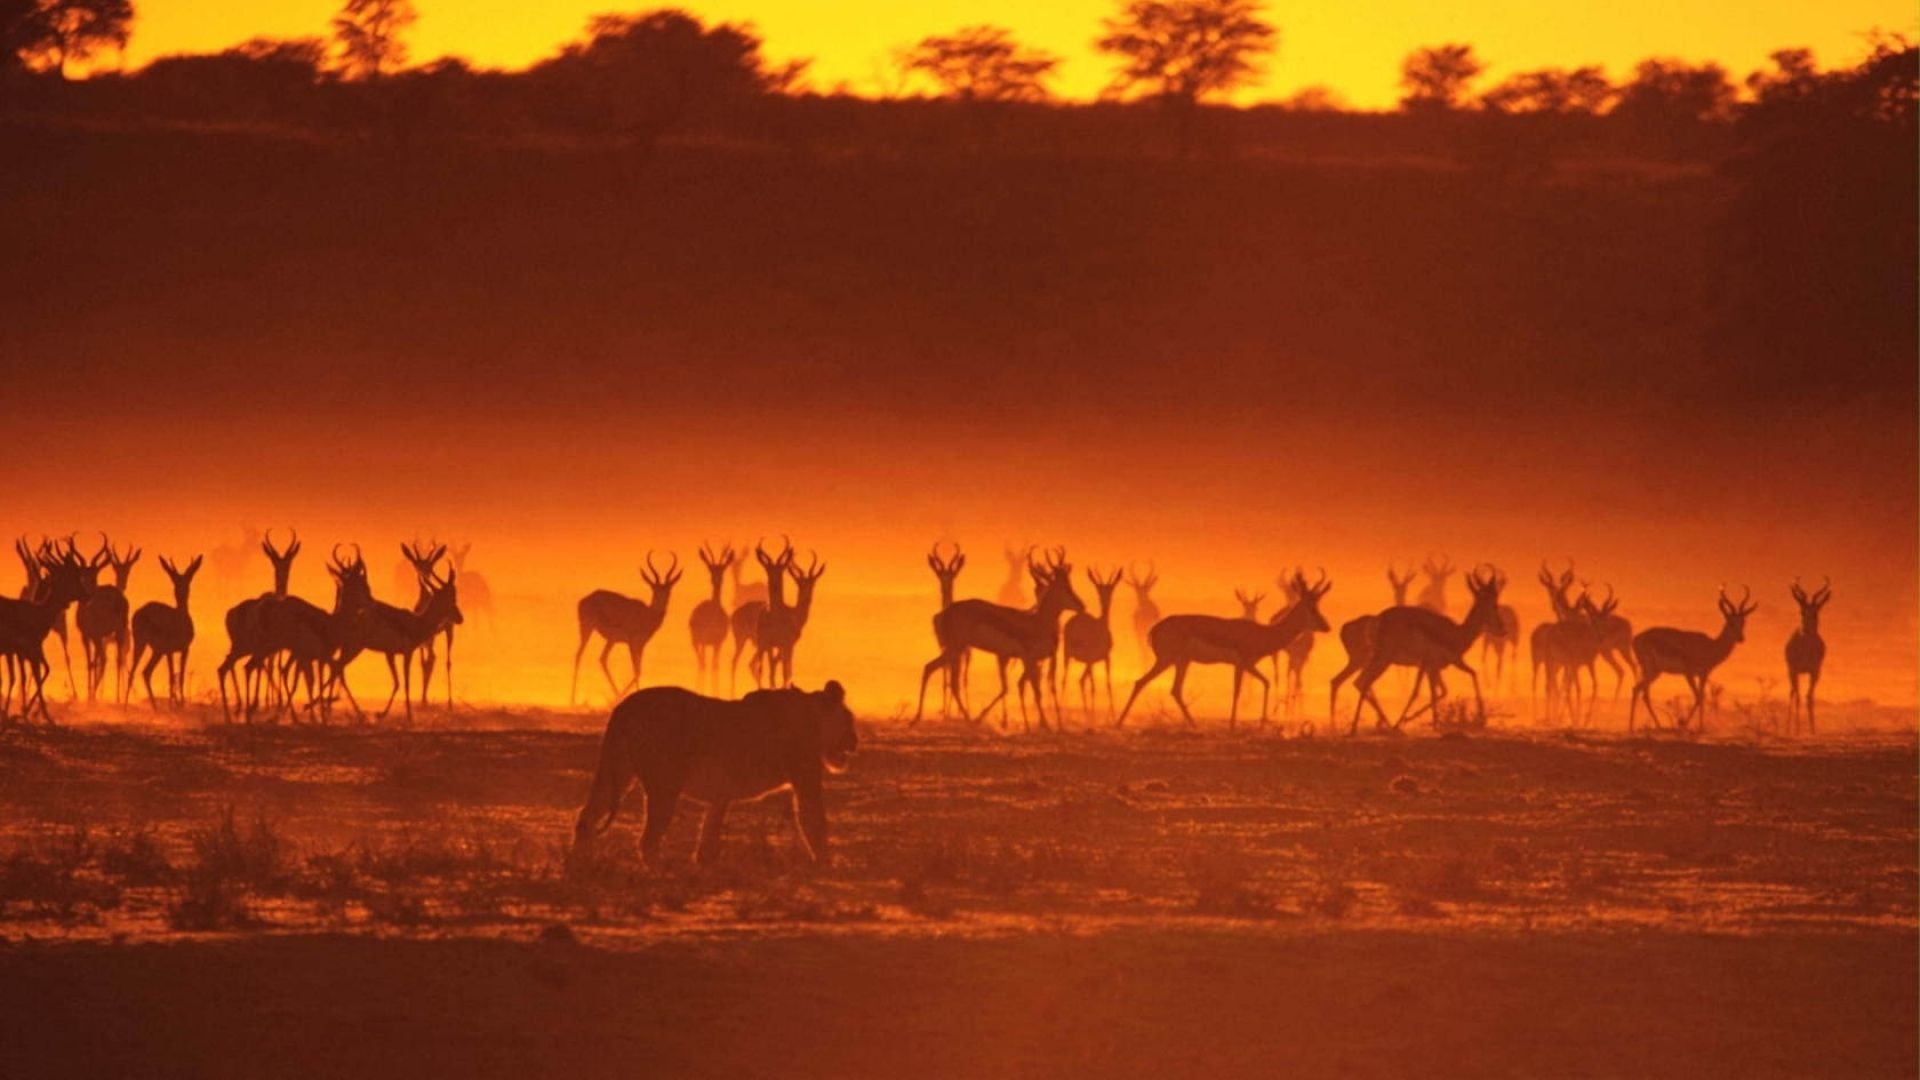 Antelope Africa At Sunset